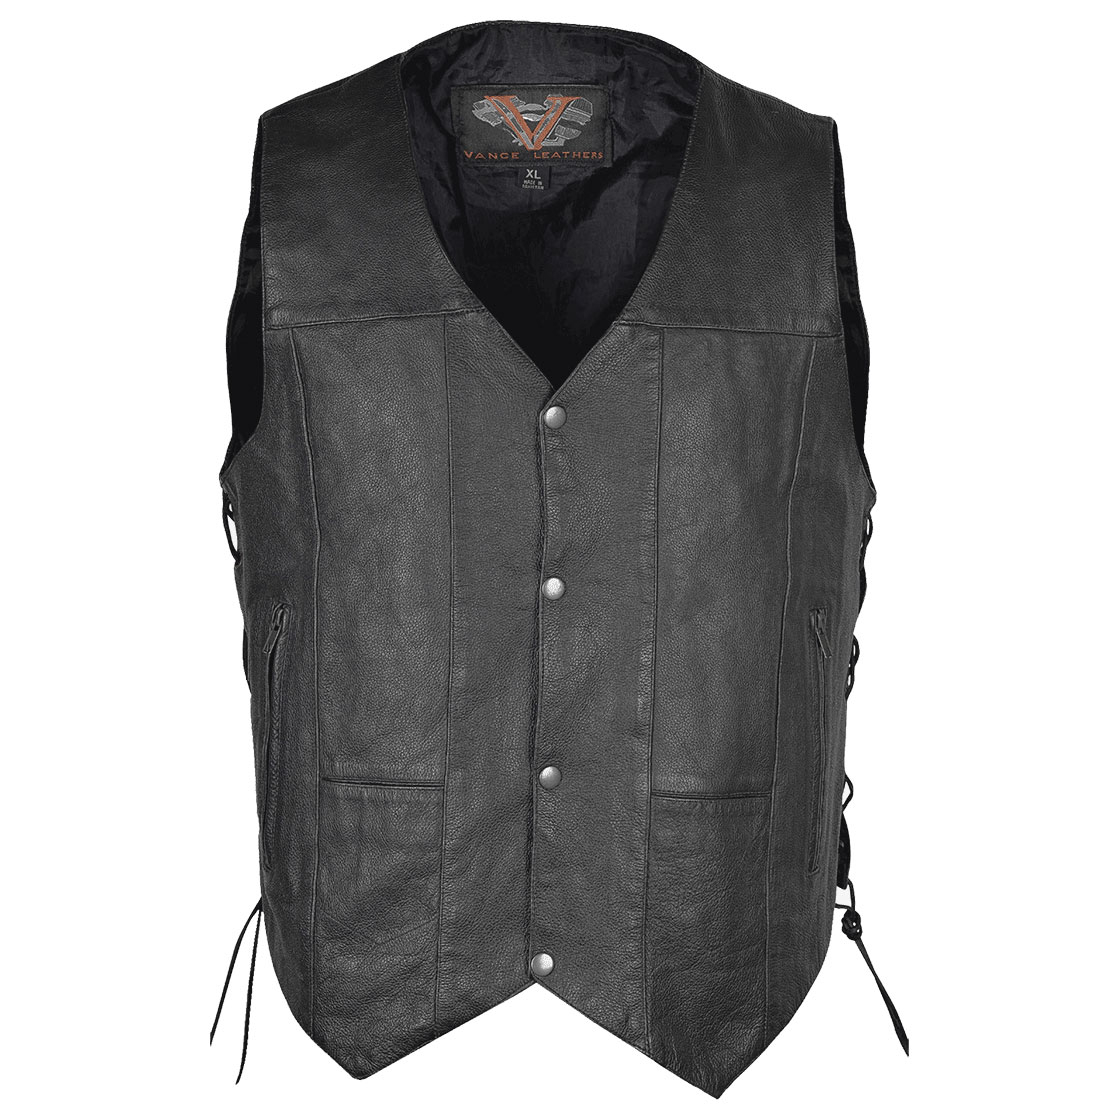 Vance Leathers Men's Ten Pocket Side Lace Black Leather Vest